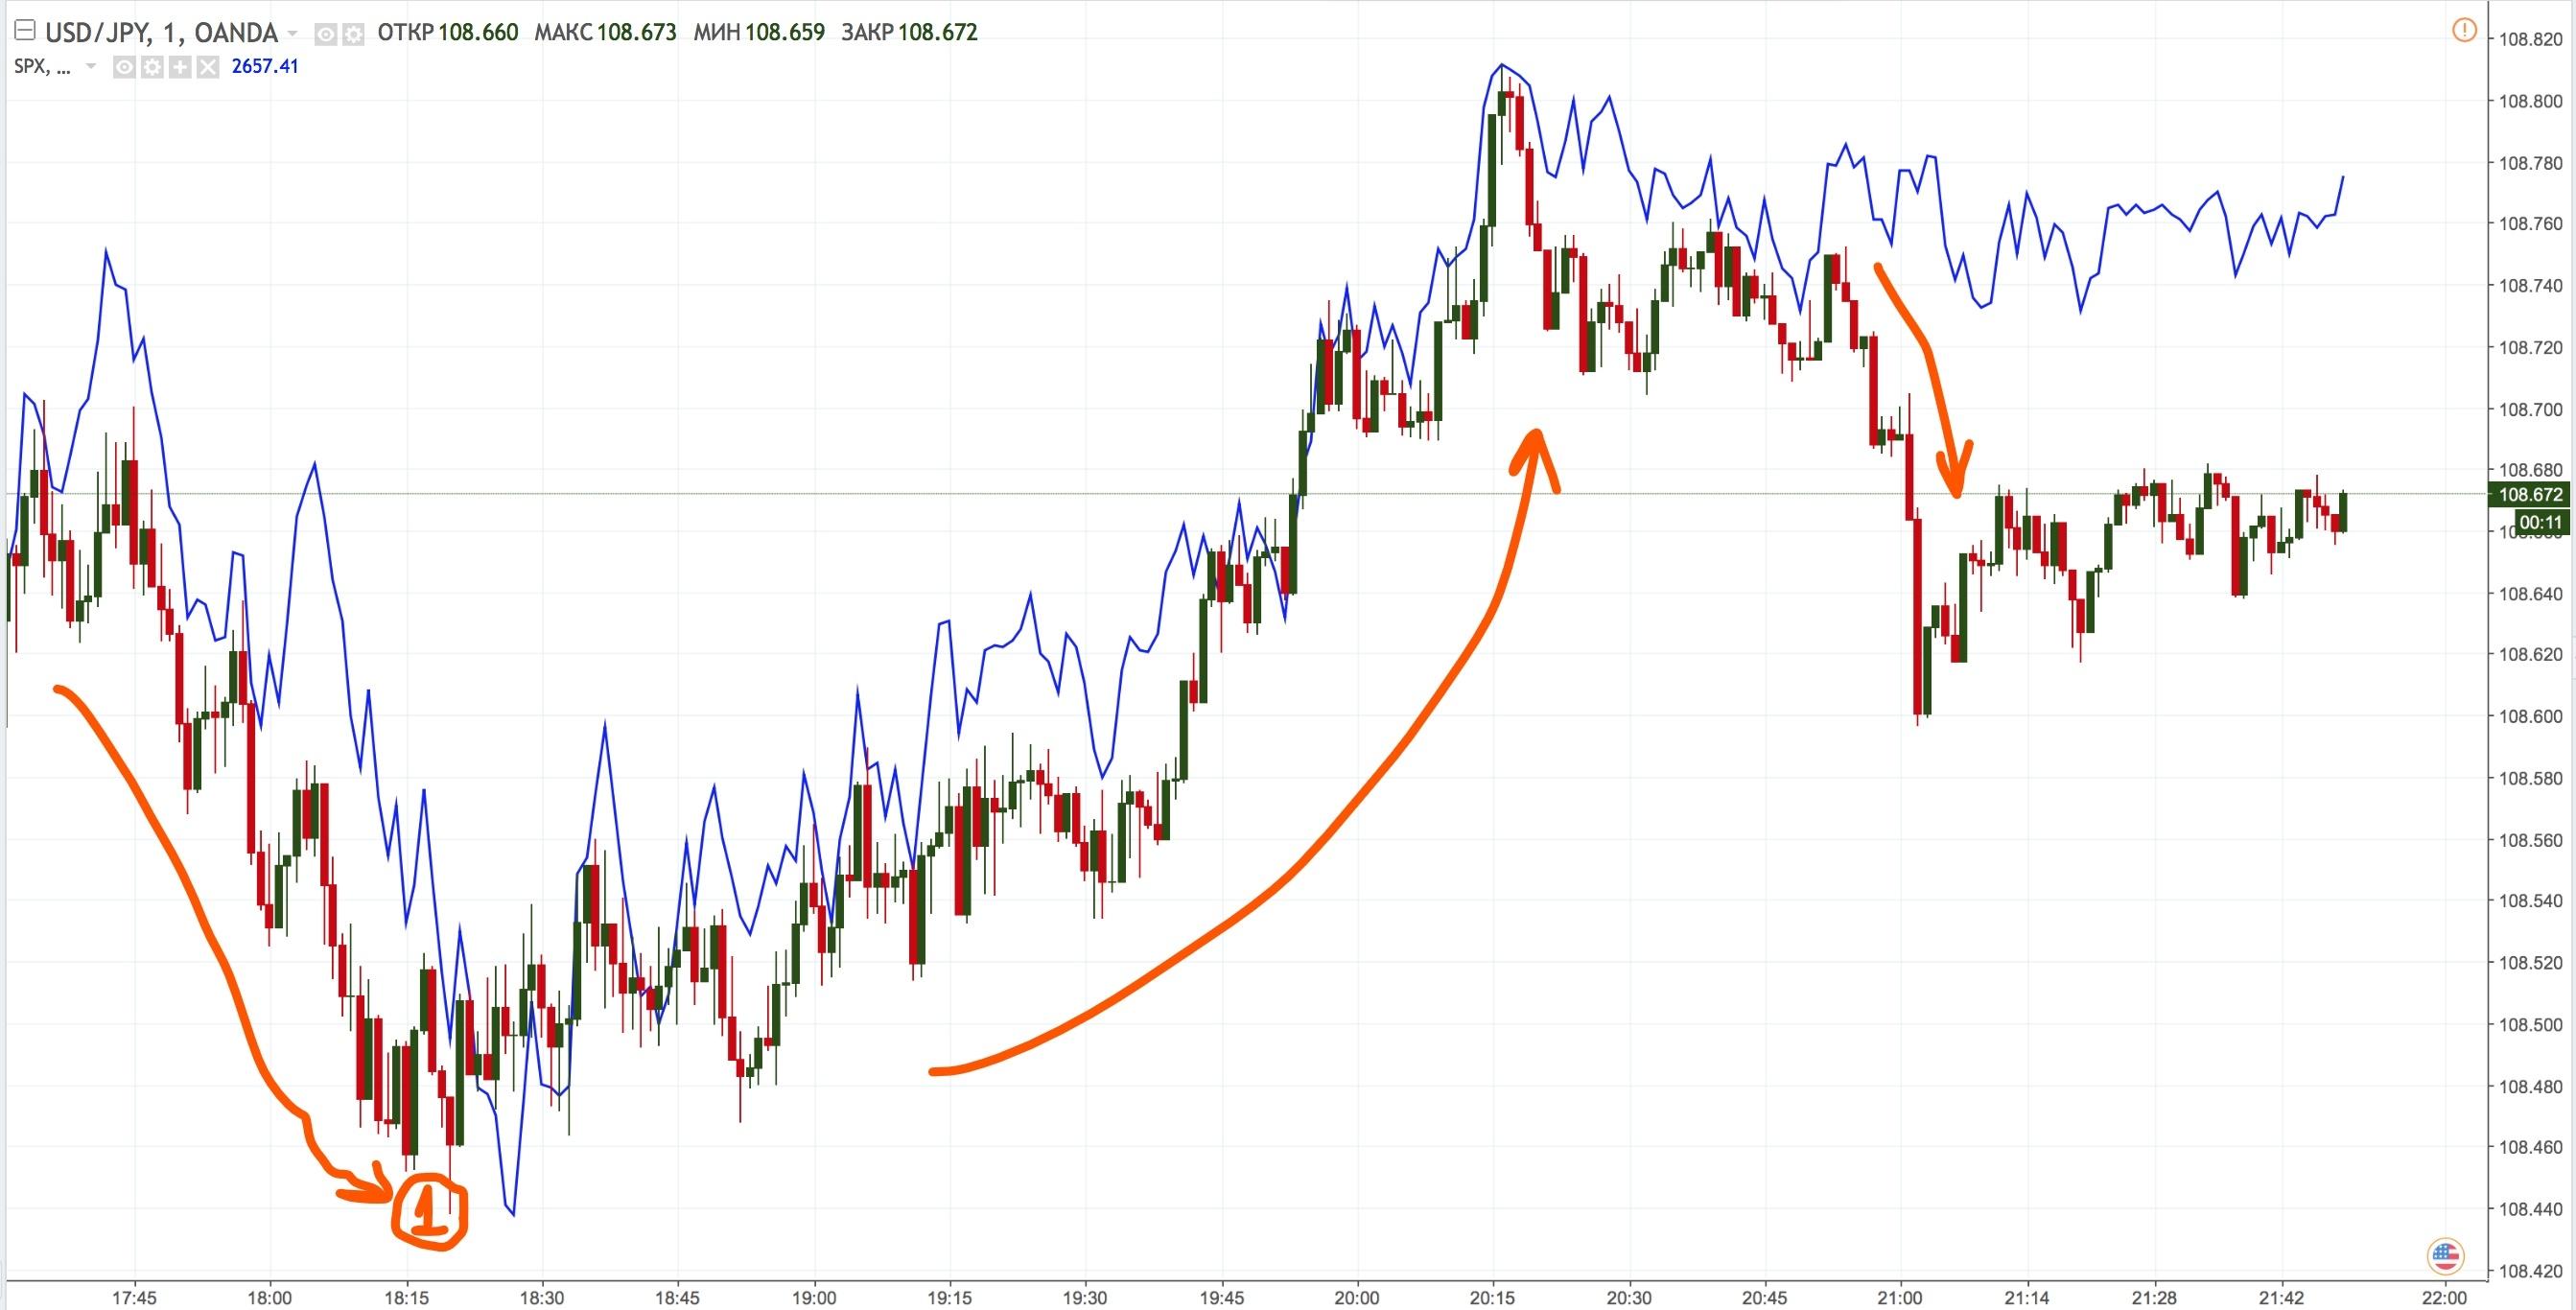 Analysis USDJPY-S&P500-2